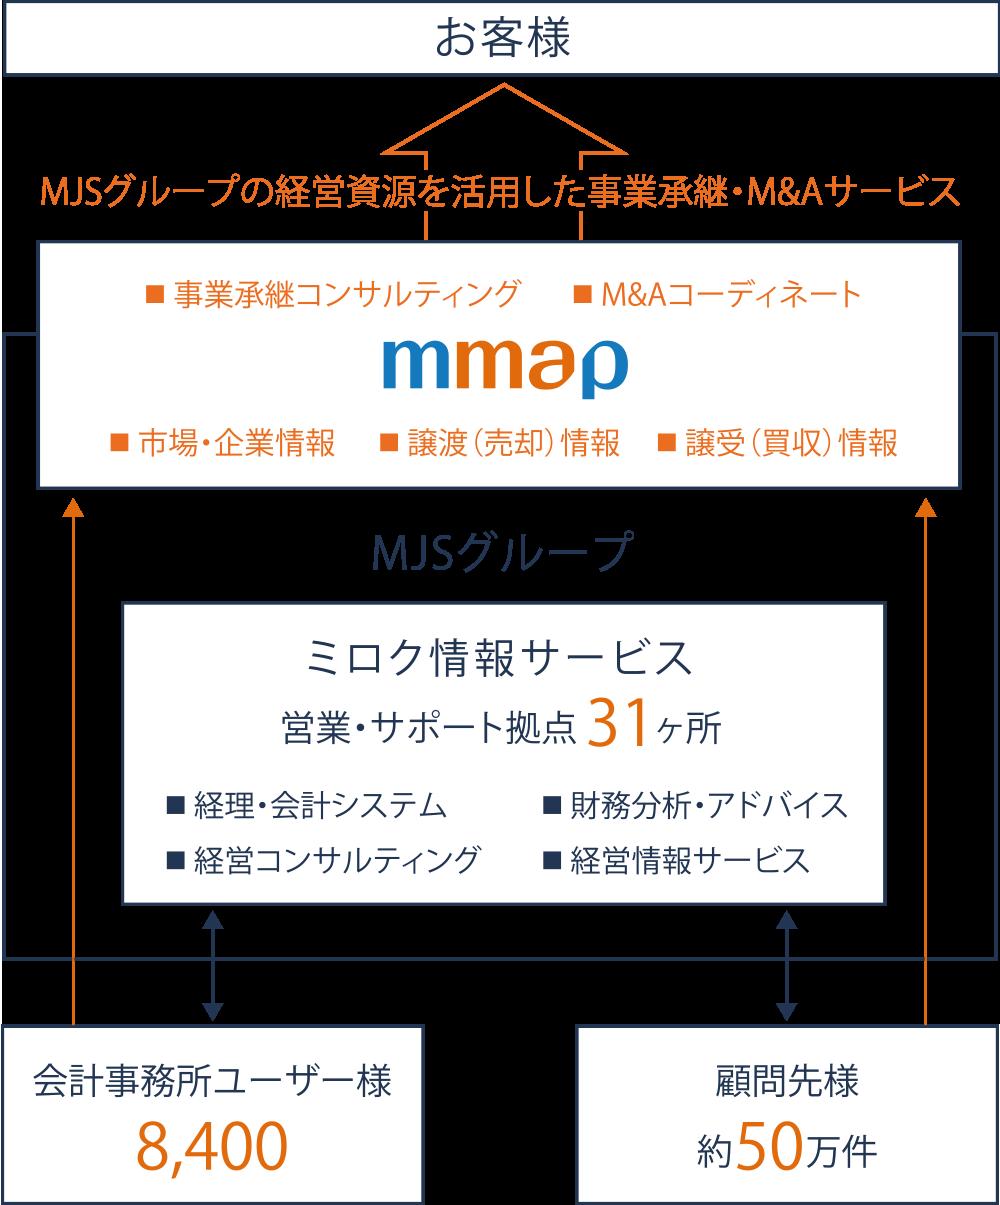 M&Aの成約確率を高めるグループの情報量の多さとネットワークの広さ